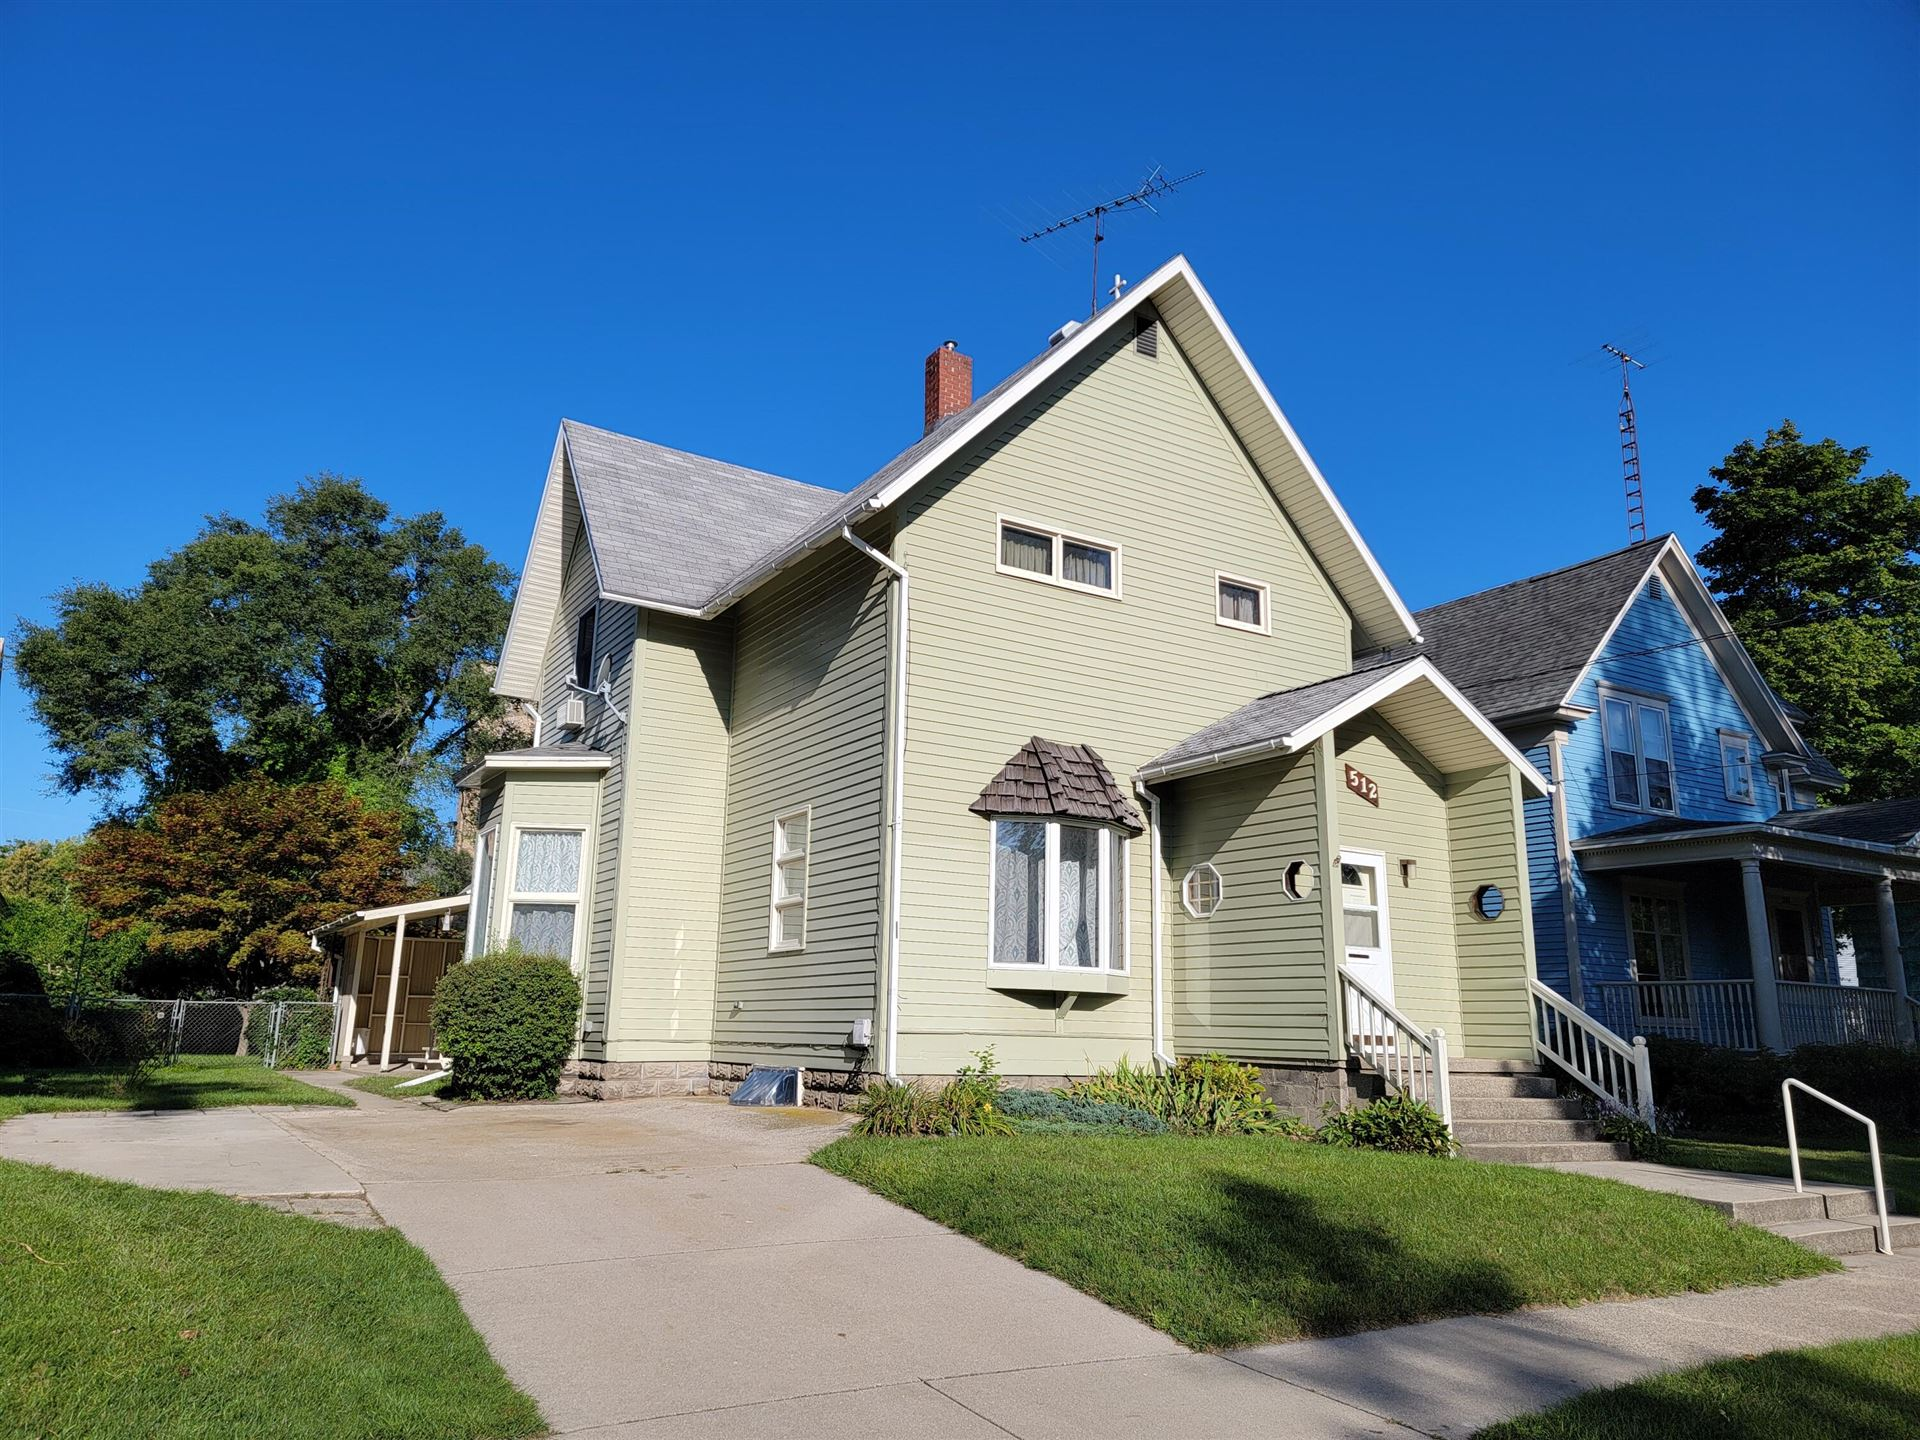 512 Fairview Avenue, Manistee, MI 49660 - MLS#: 21104887